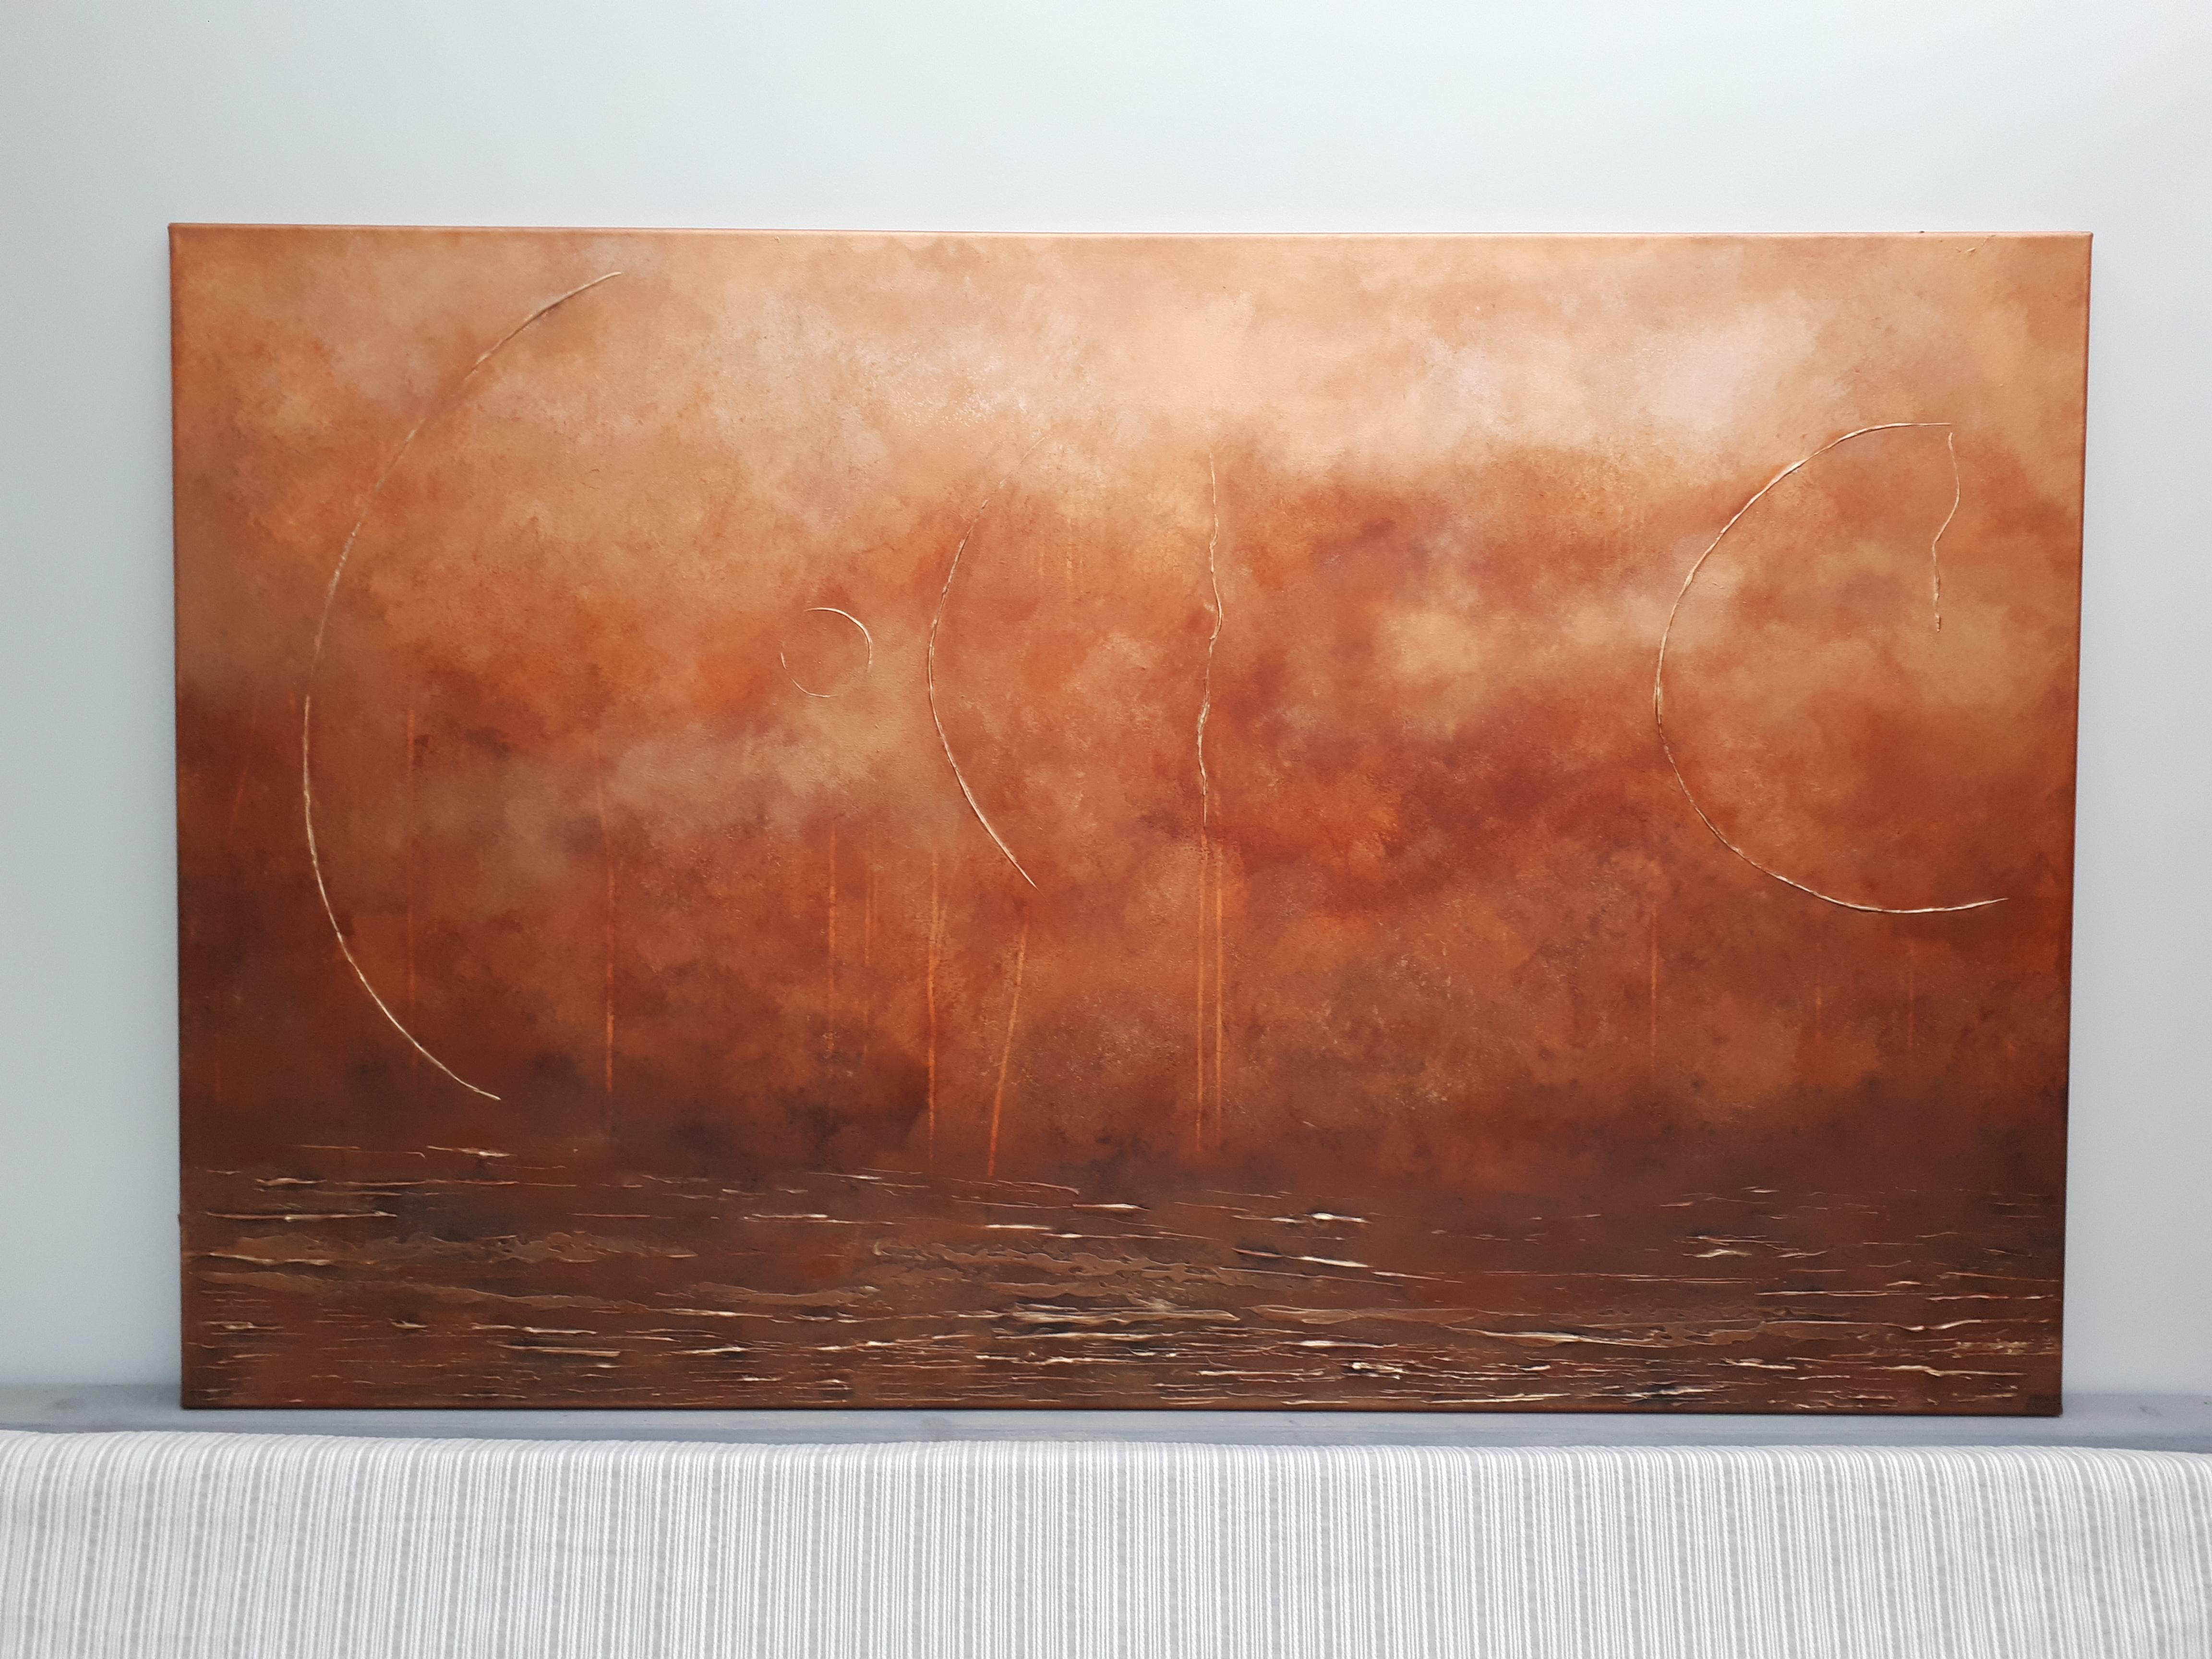 Kunstwerk Orlando Frances Eckhardt FE11 abstract schilderij